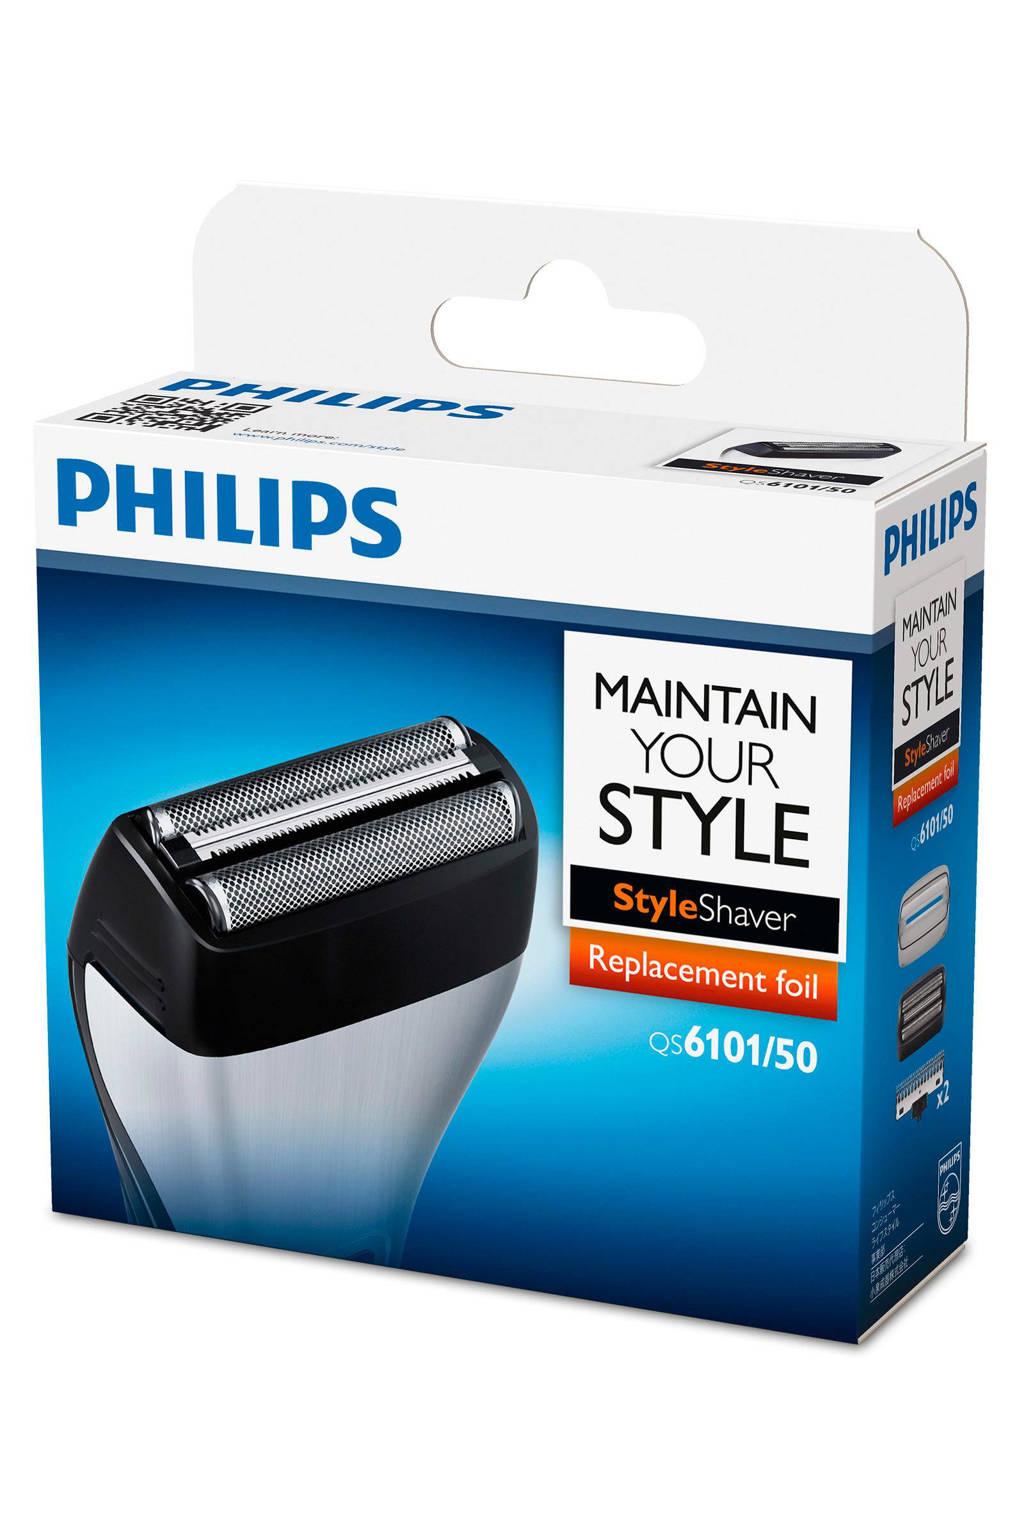 Philips QS6101/50 StyleShaver scheerblad